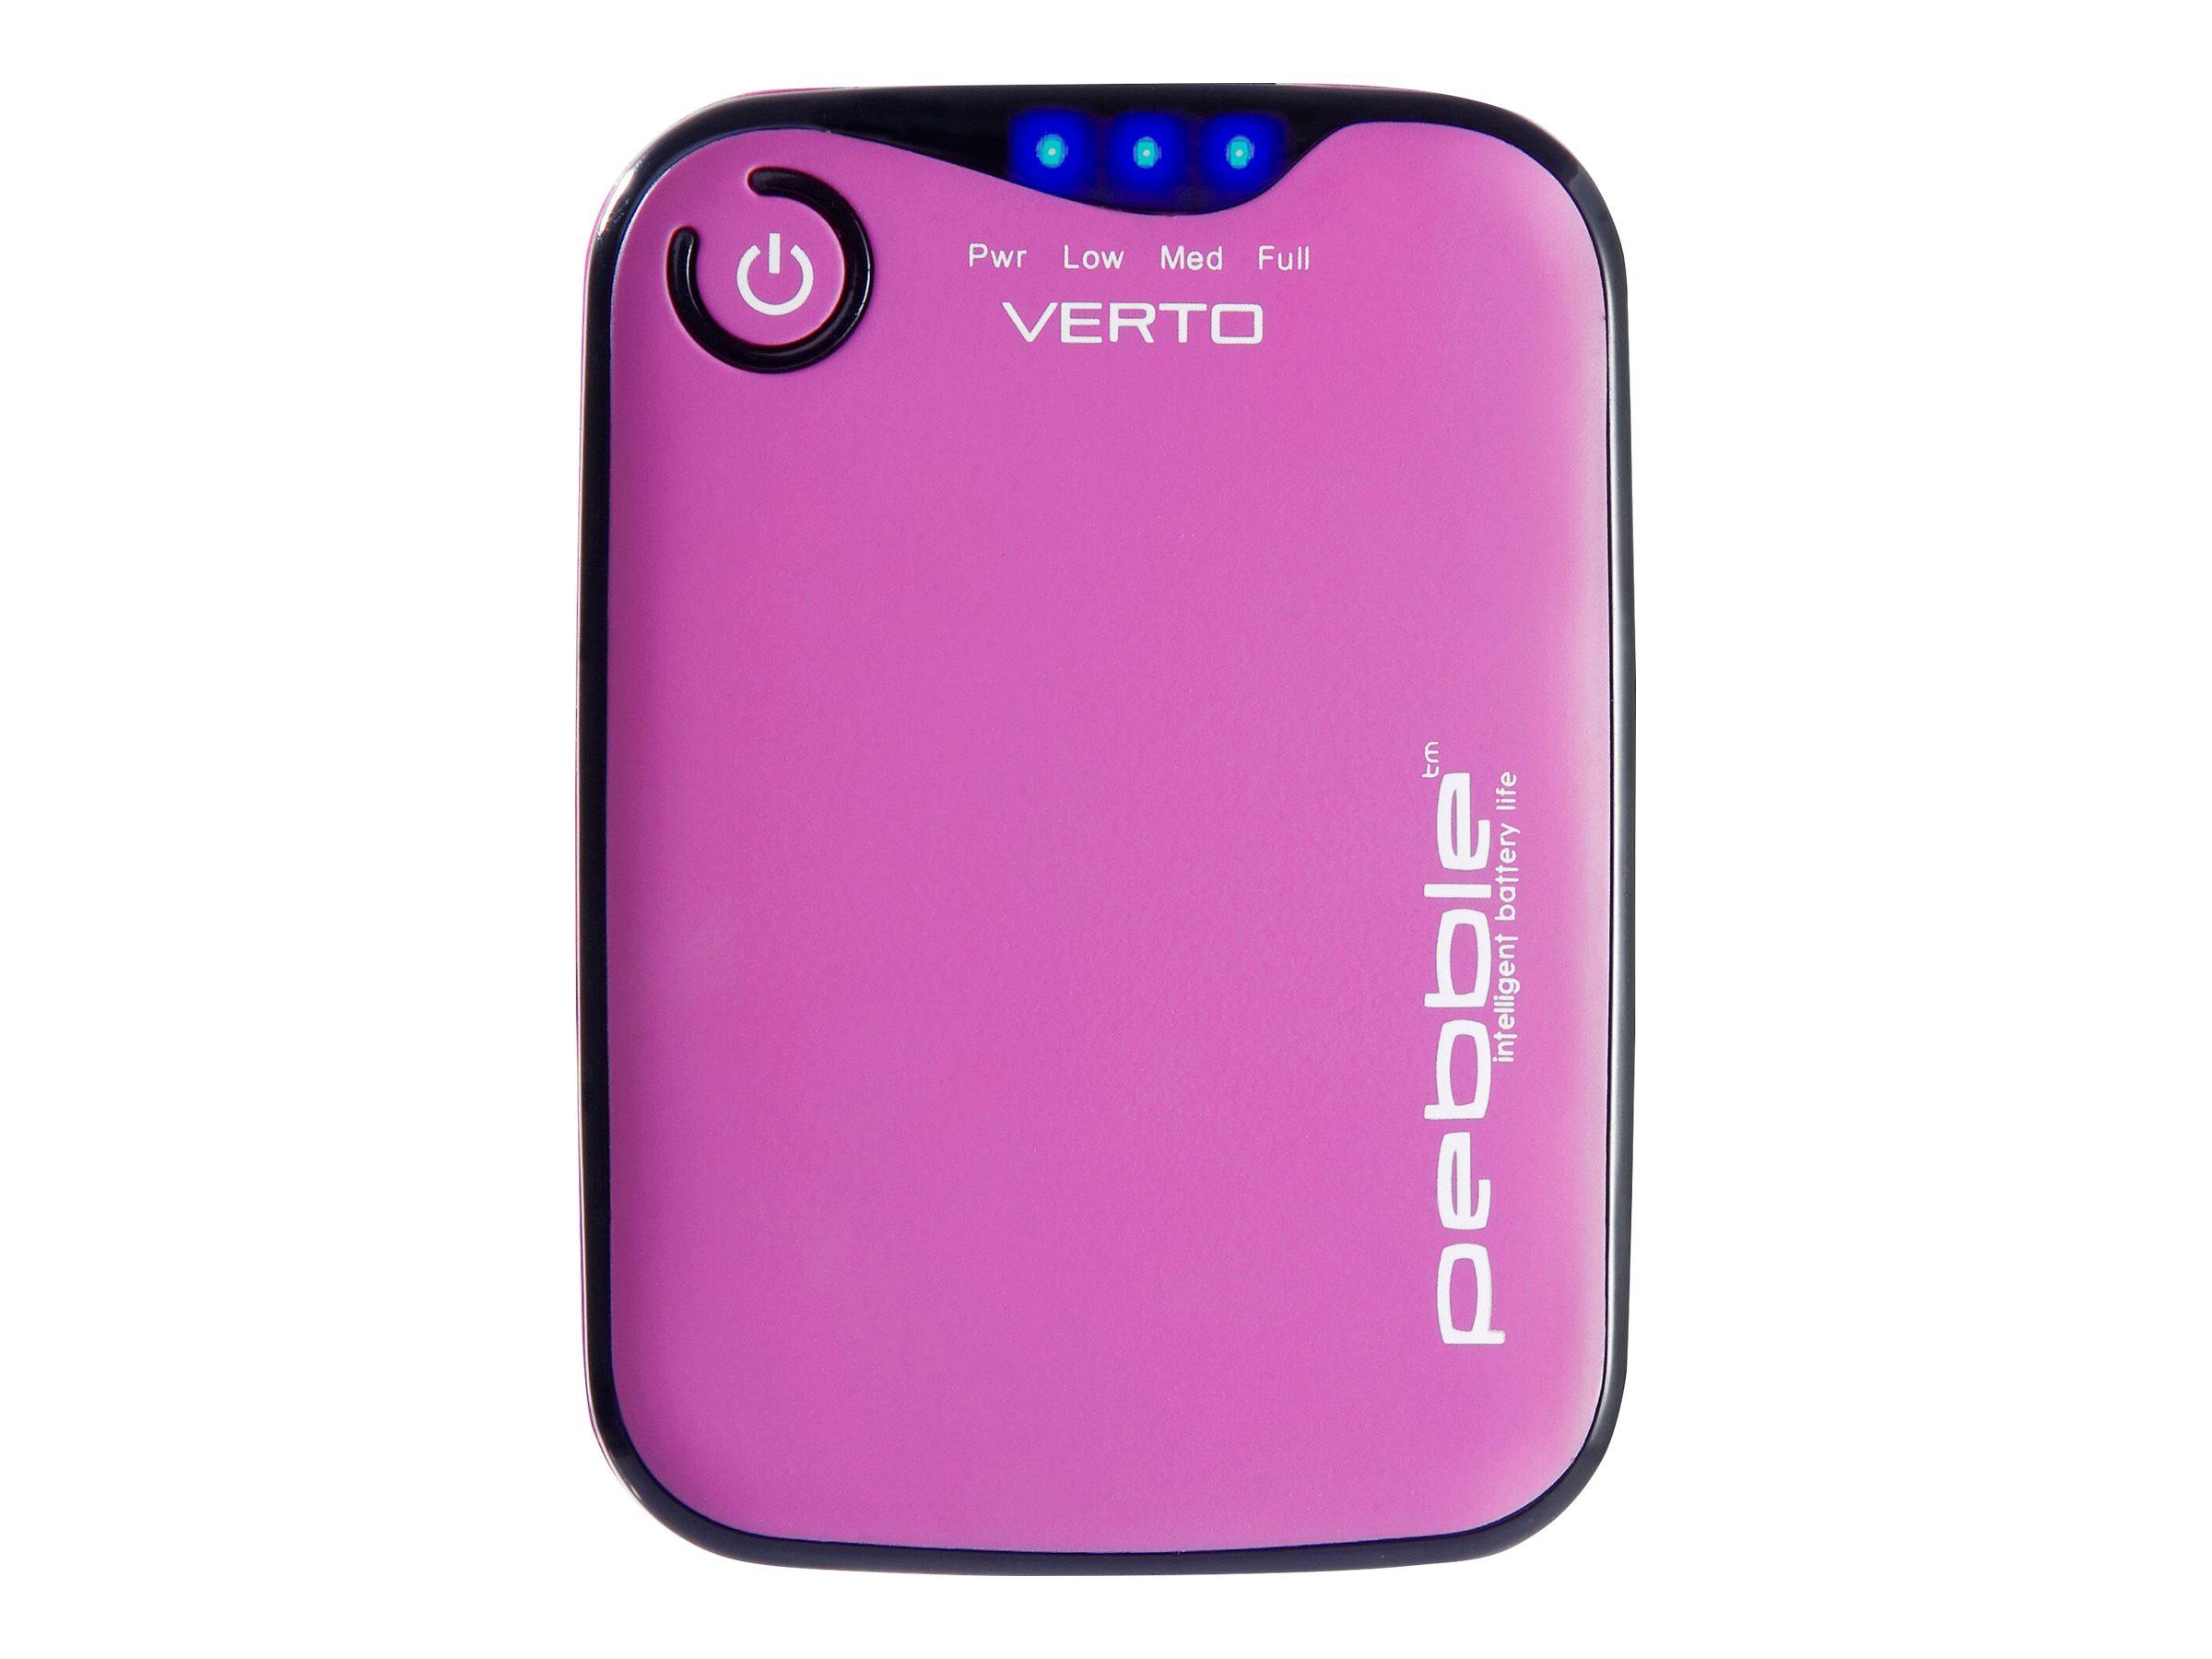 Veho Pebble Verto - Powerbank - 3700 mAh - 1000 mA (USB) - pink